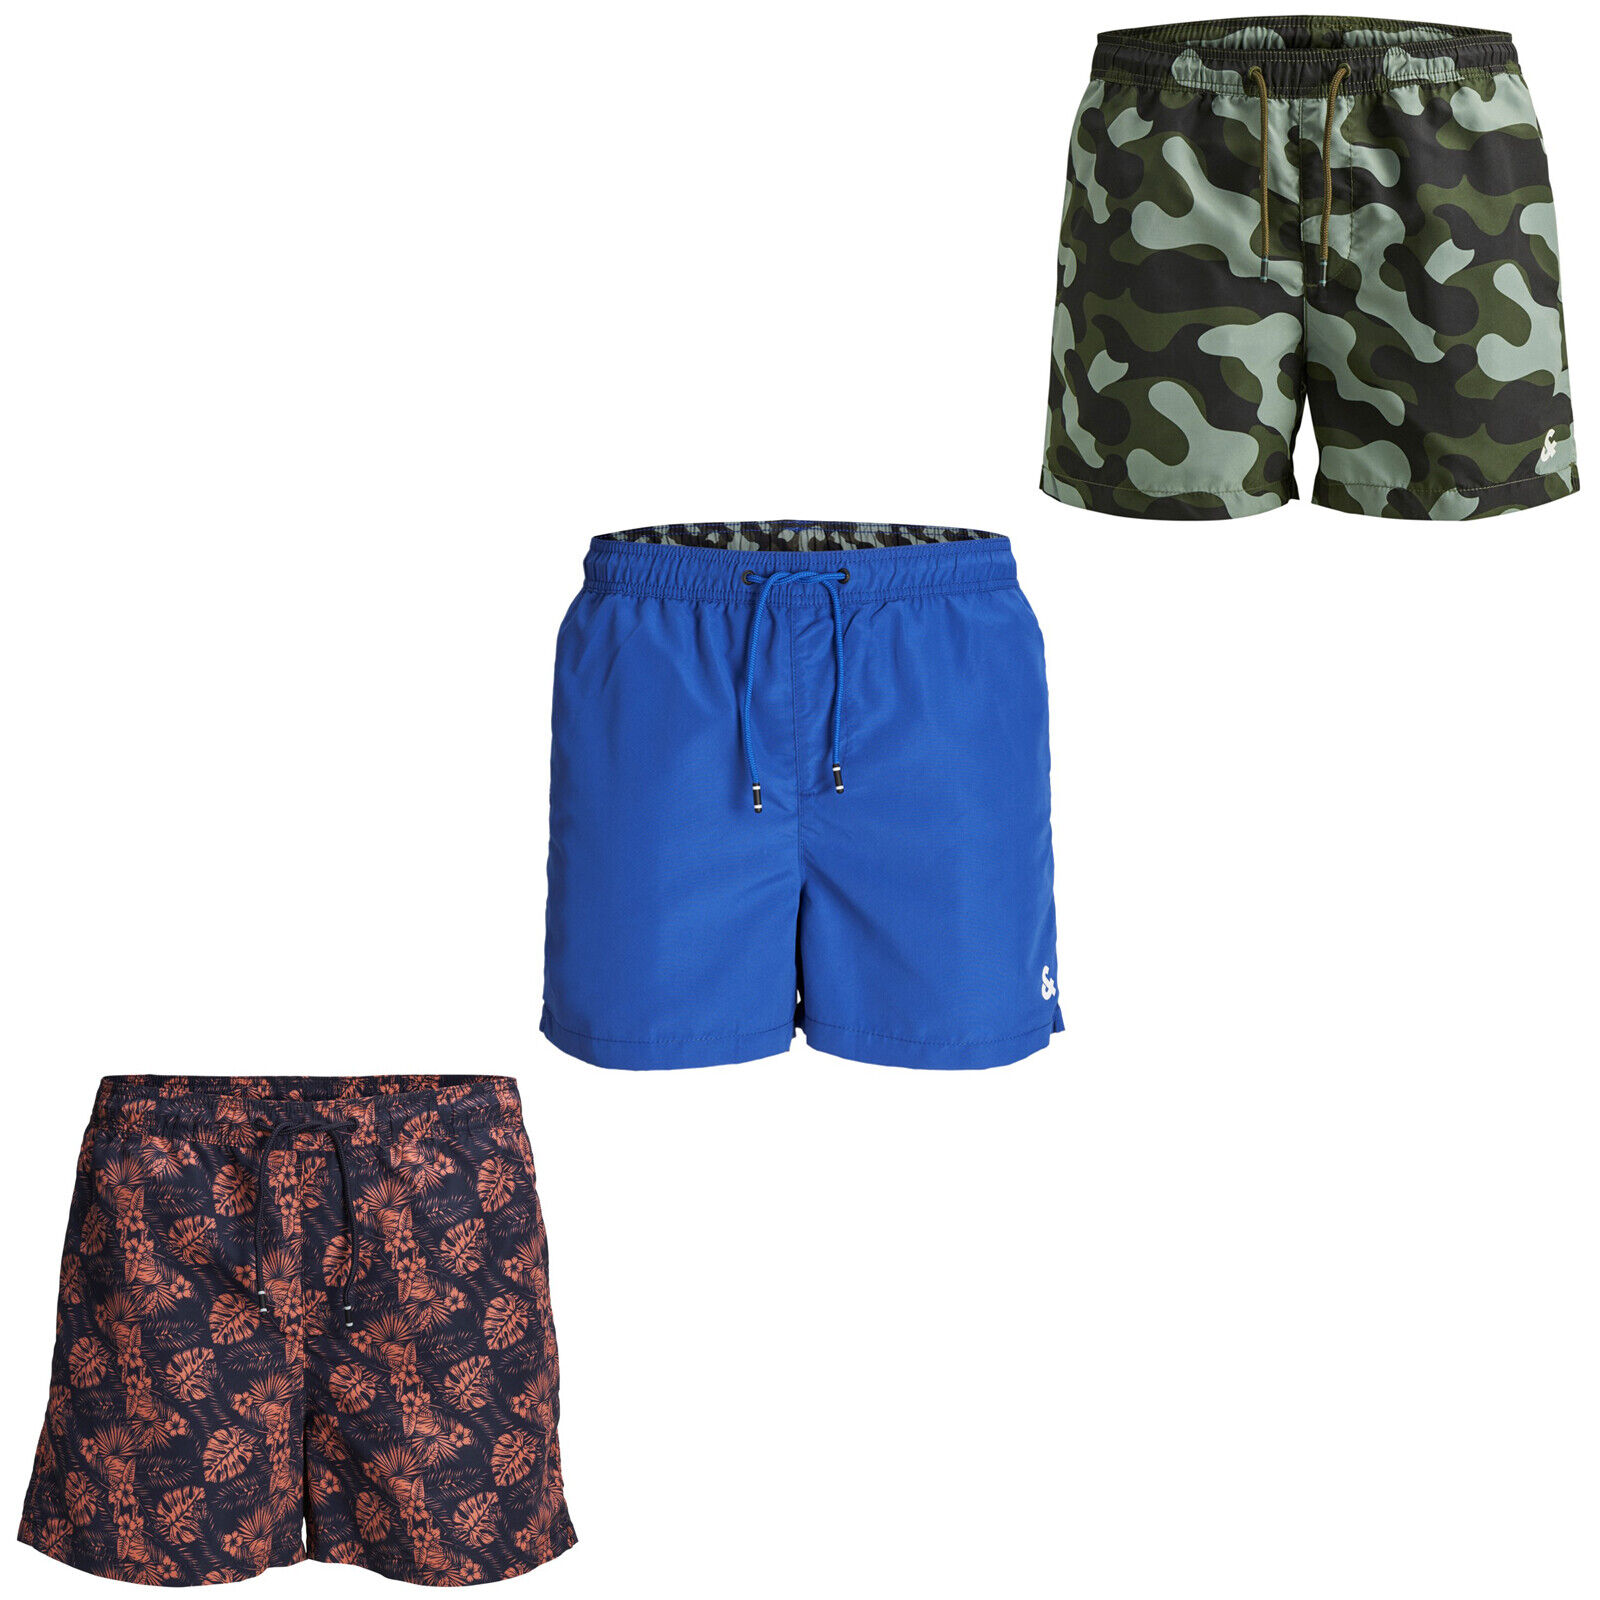 Jack /& Jones Mens Swim Shorts Quick Dry Drawstring Elasticated Trunks Swimwear